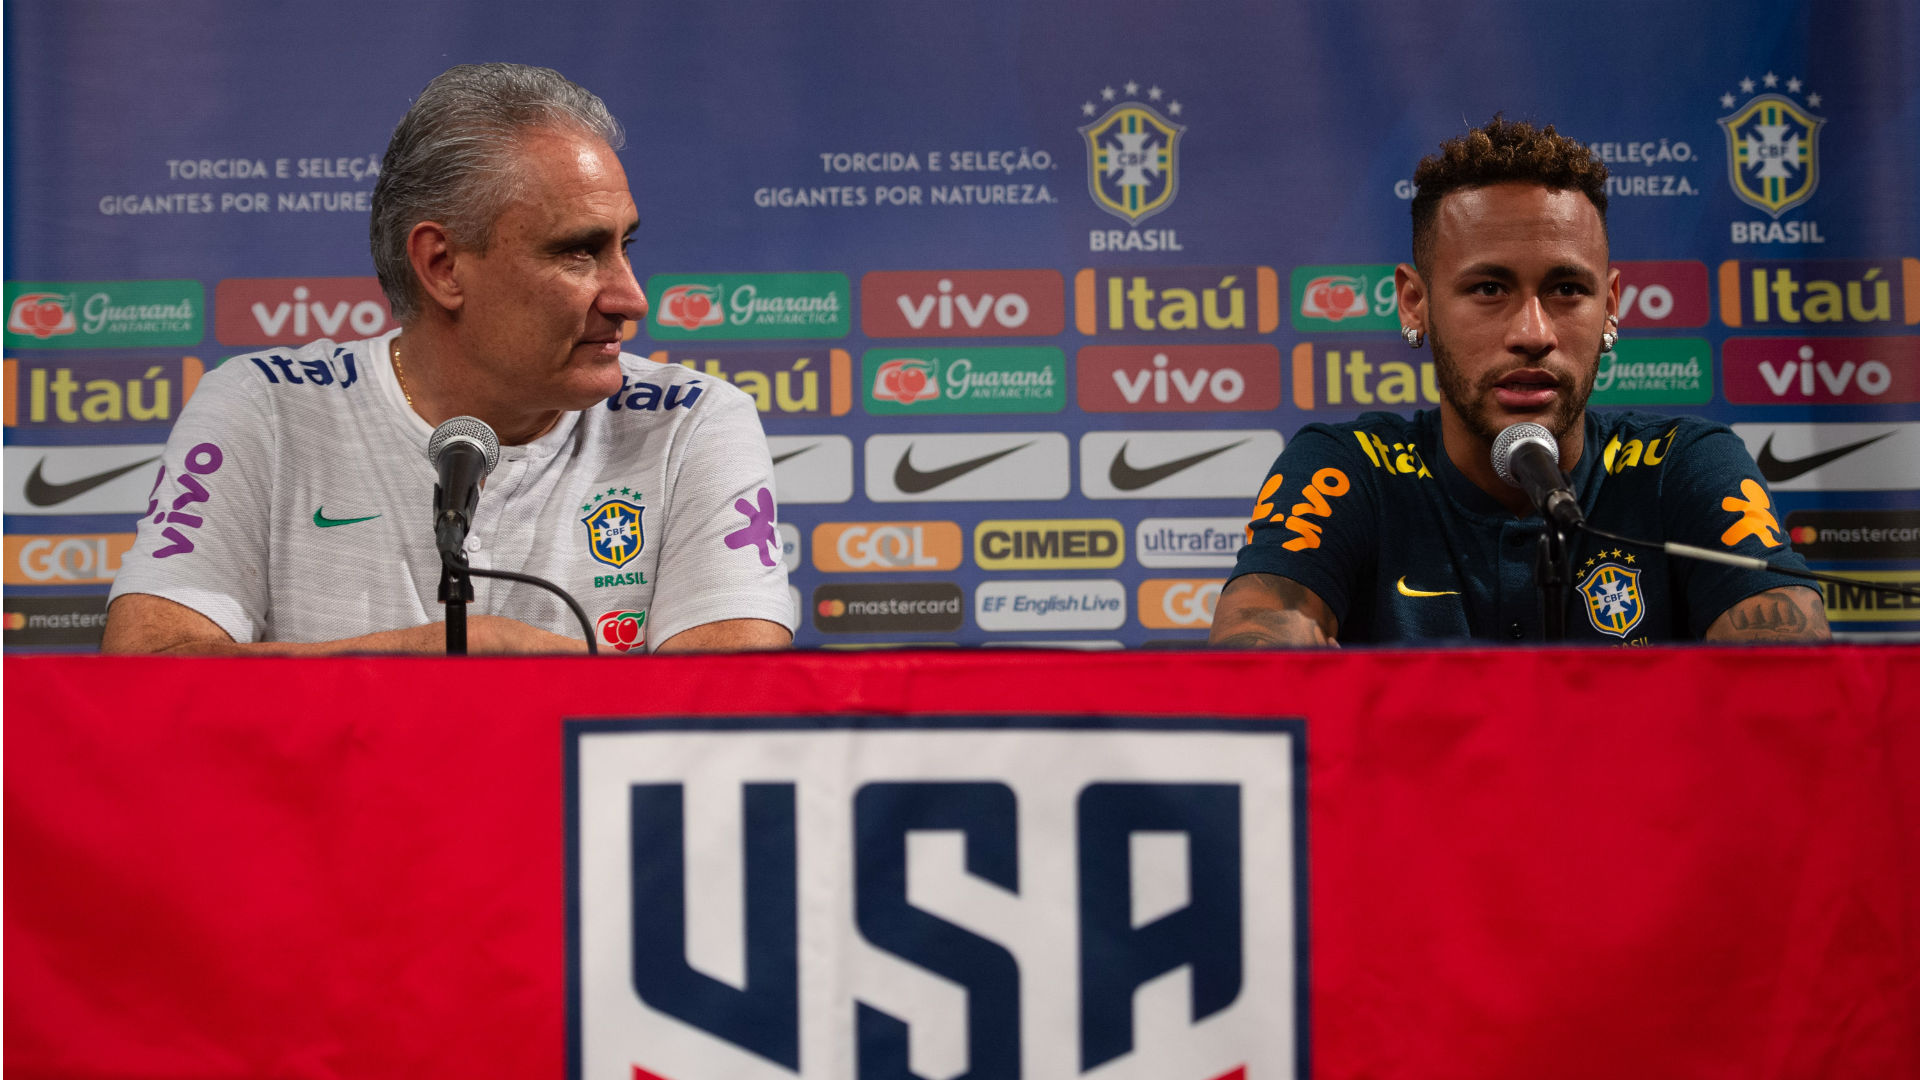 Tite Neymar Seleção Brasil 06 09 2018